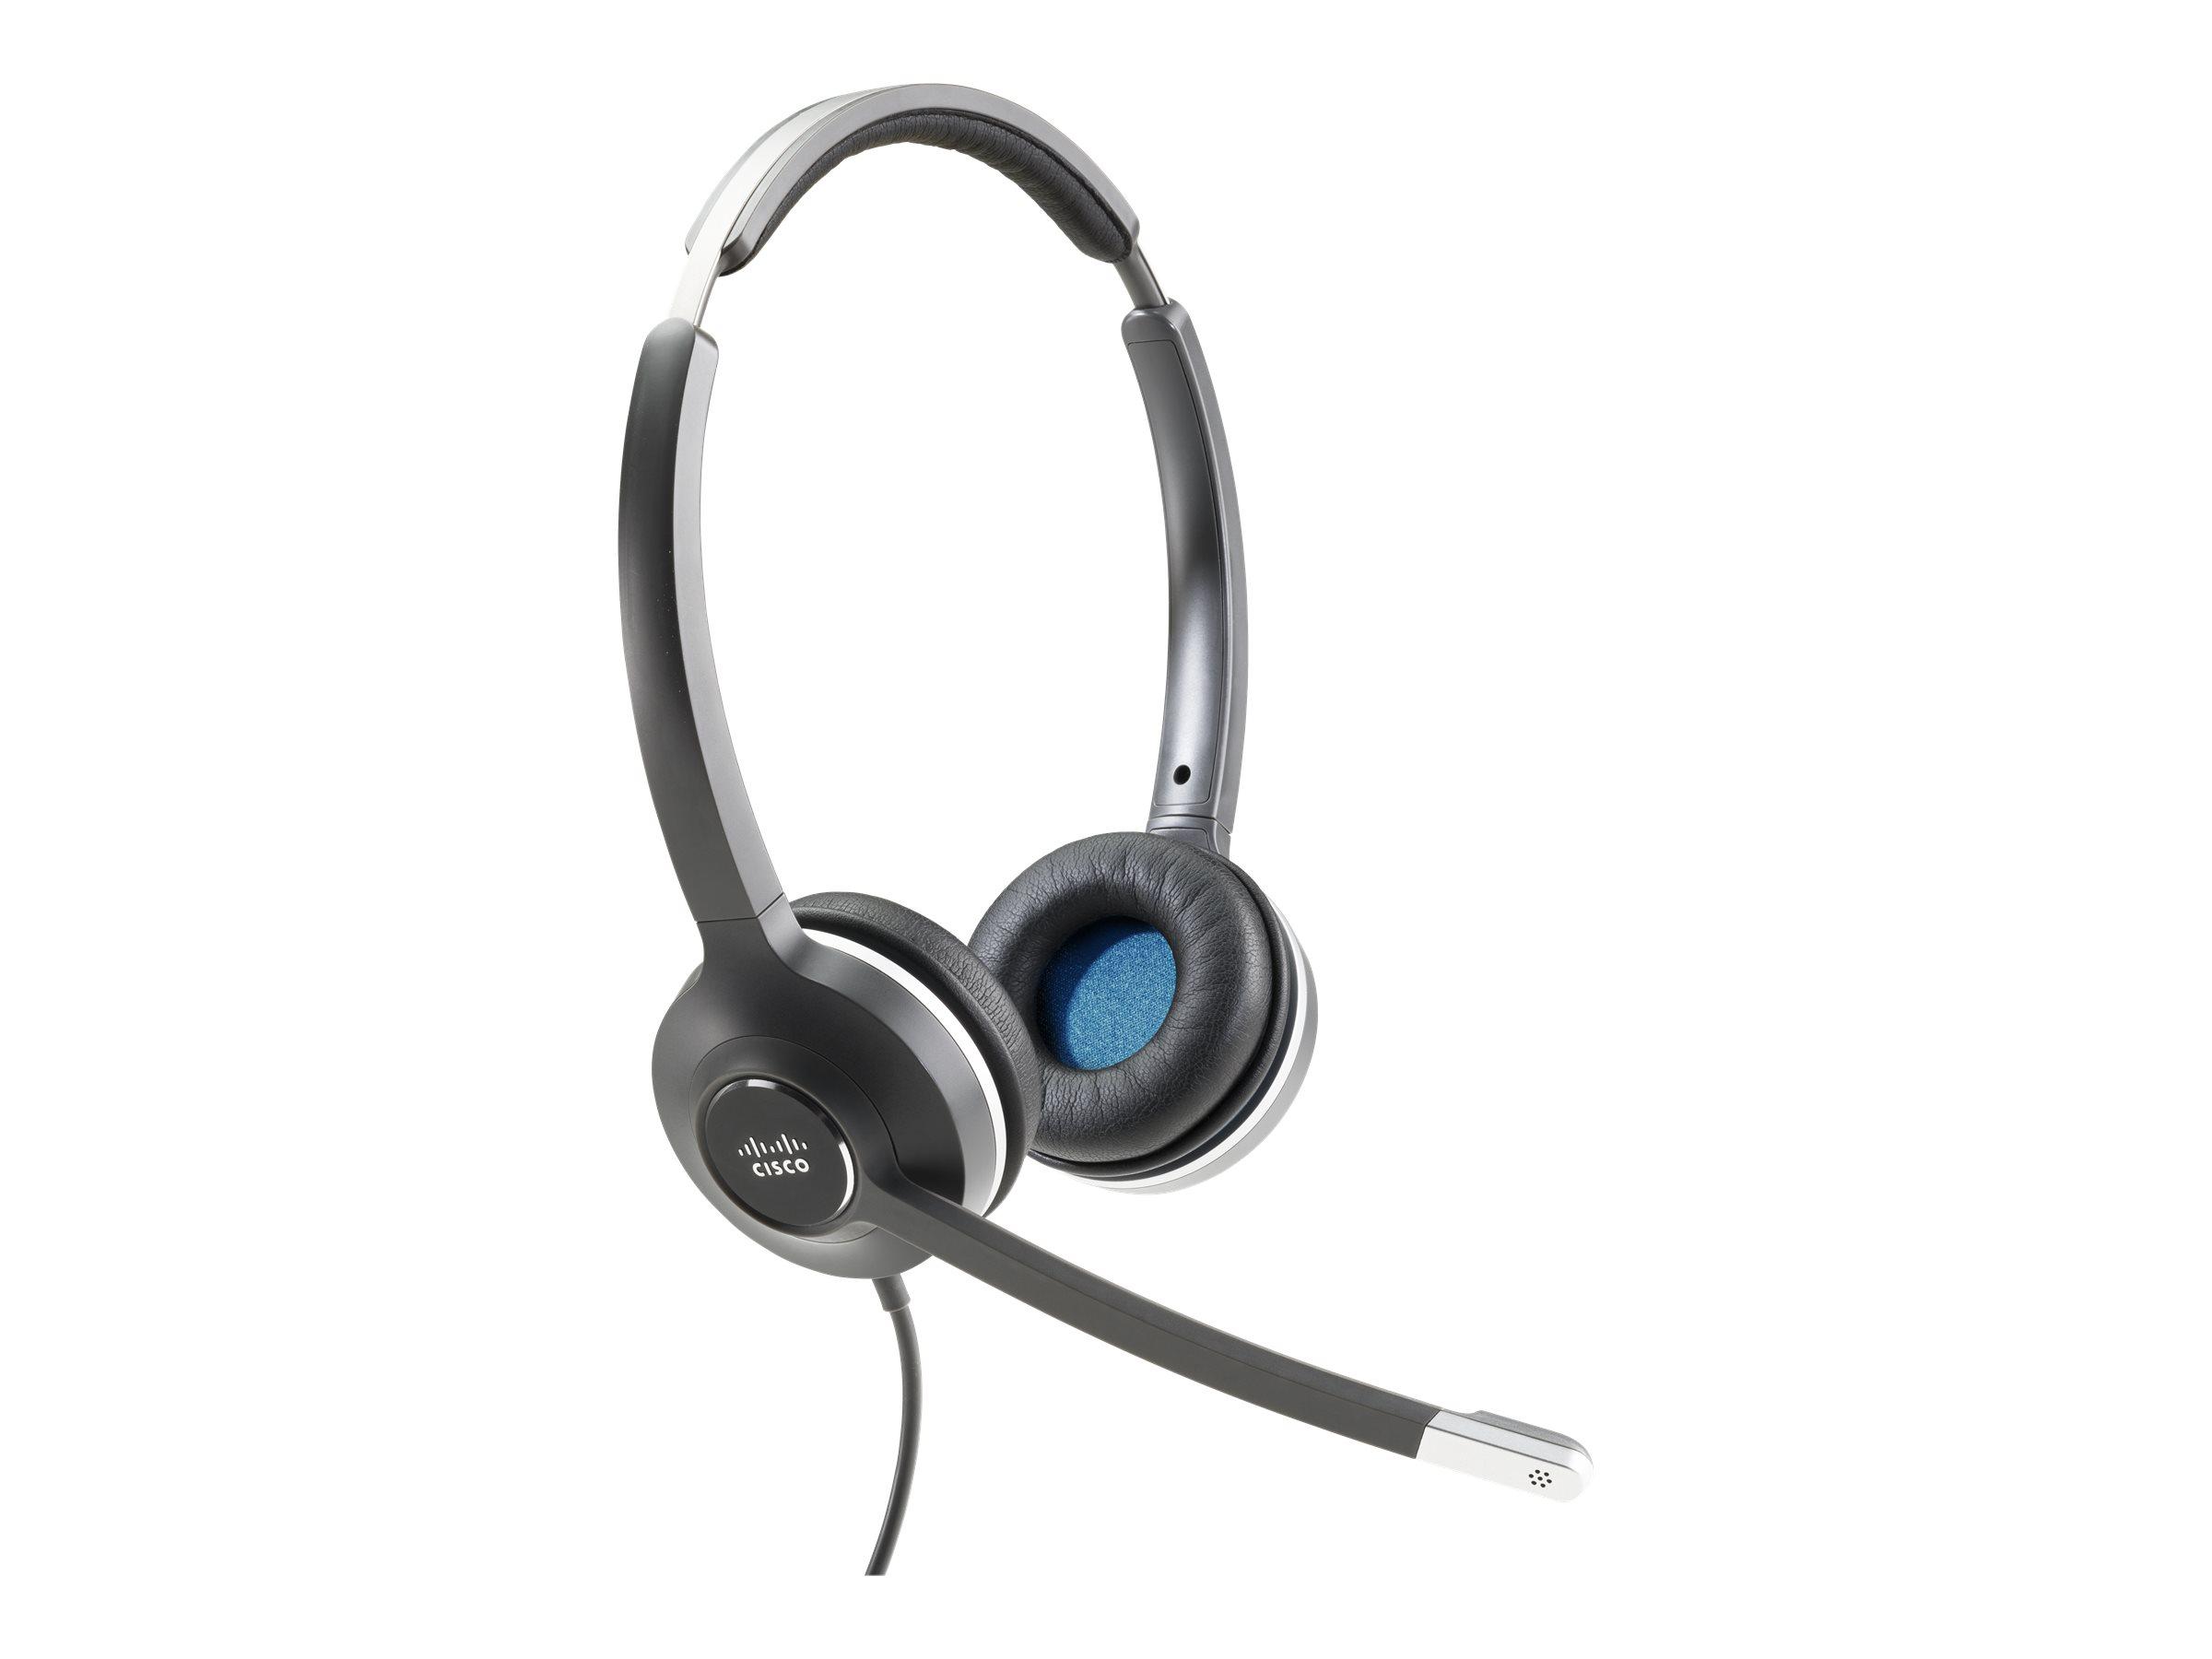 Cisco 532 Wired Dual - Headset - On-Ear - kabelgebunden